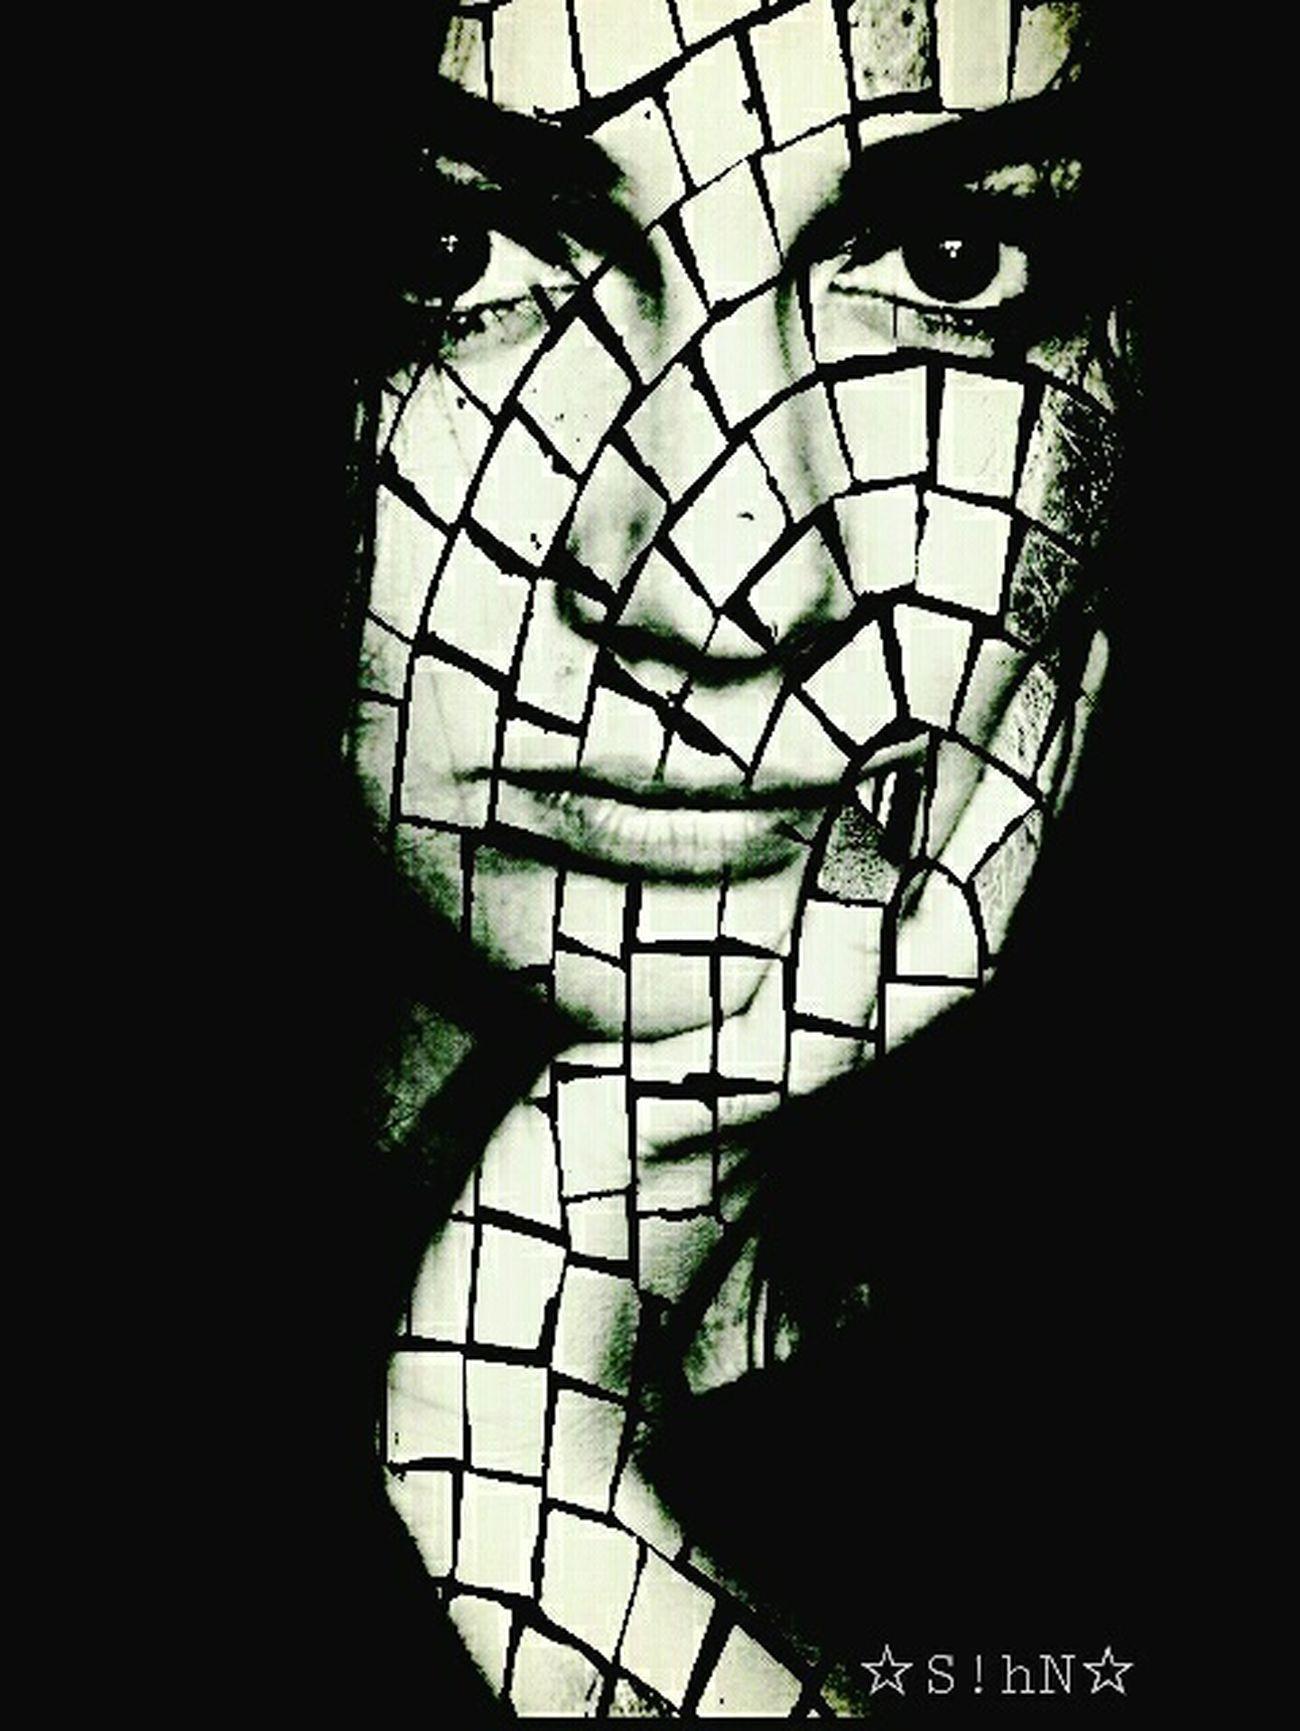 MYArtwork❤ Art, Drawing, Creativity Texture Double Exposure EyeEm Best Edits Artisticselfie Freetoedit Selfie Portrait Drawstepbystep